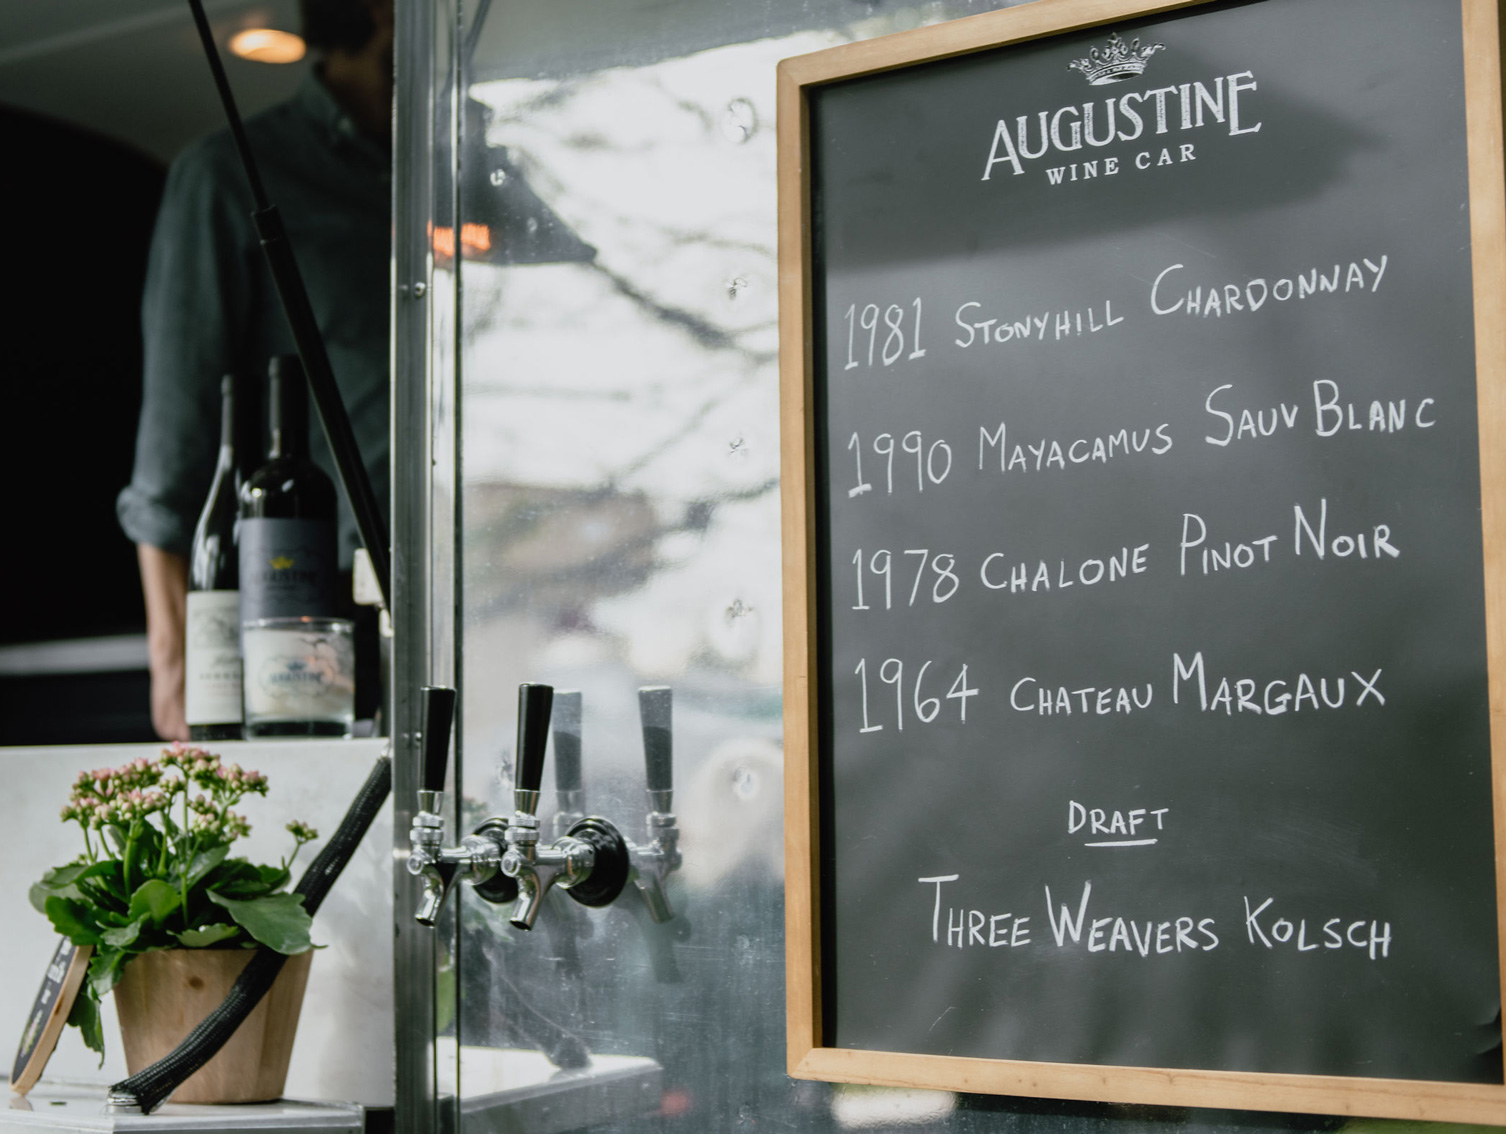 Augustine-Wine-Car-Sign.jpeg